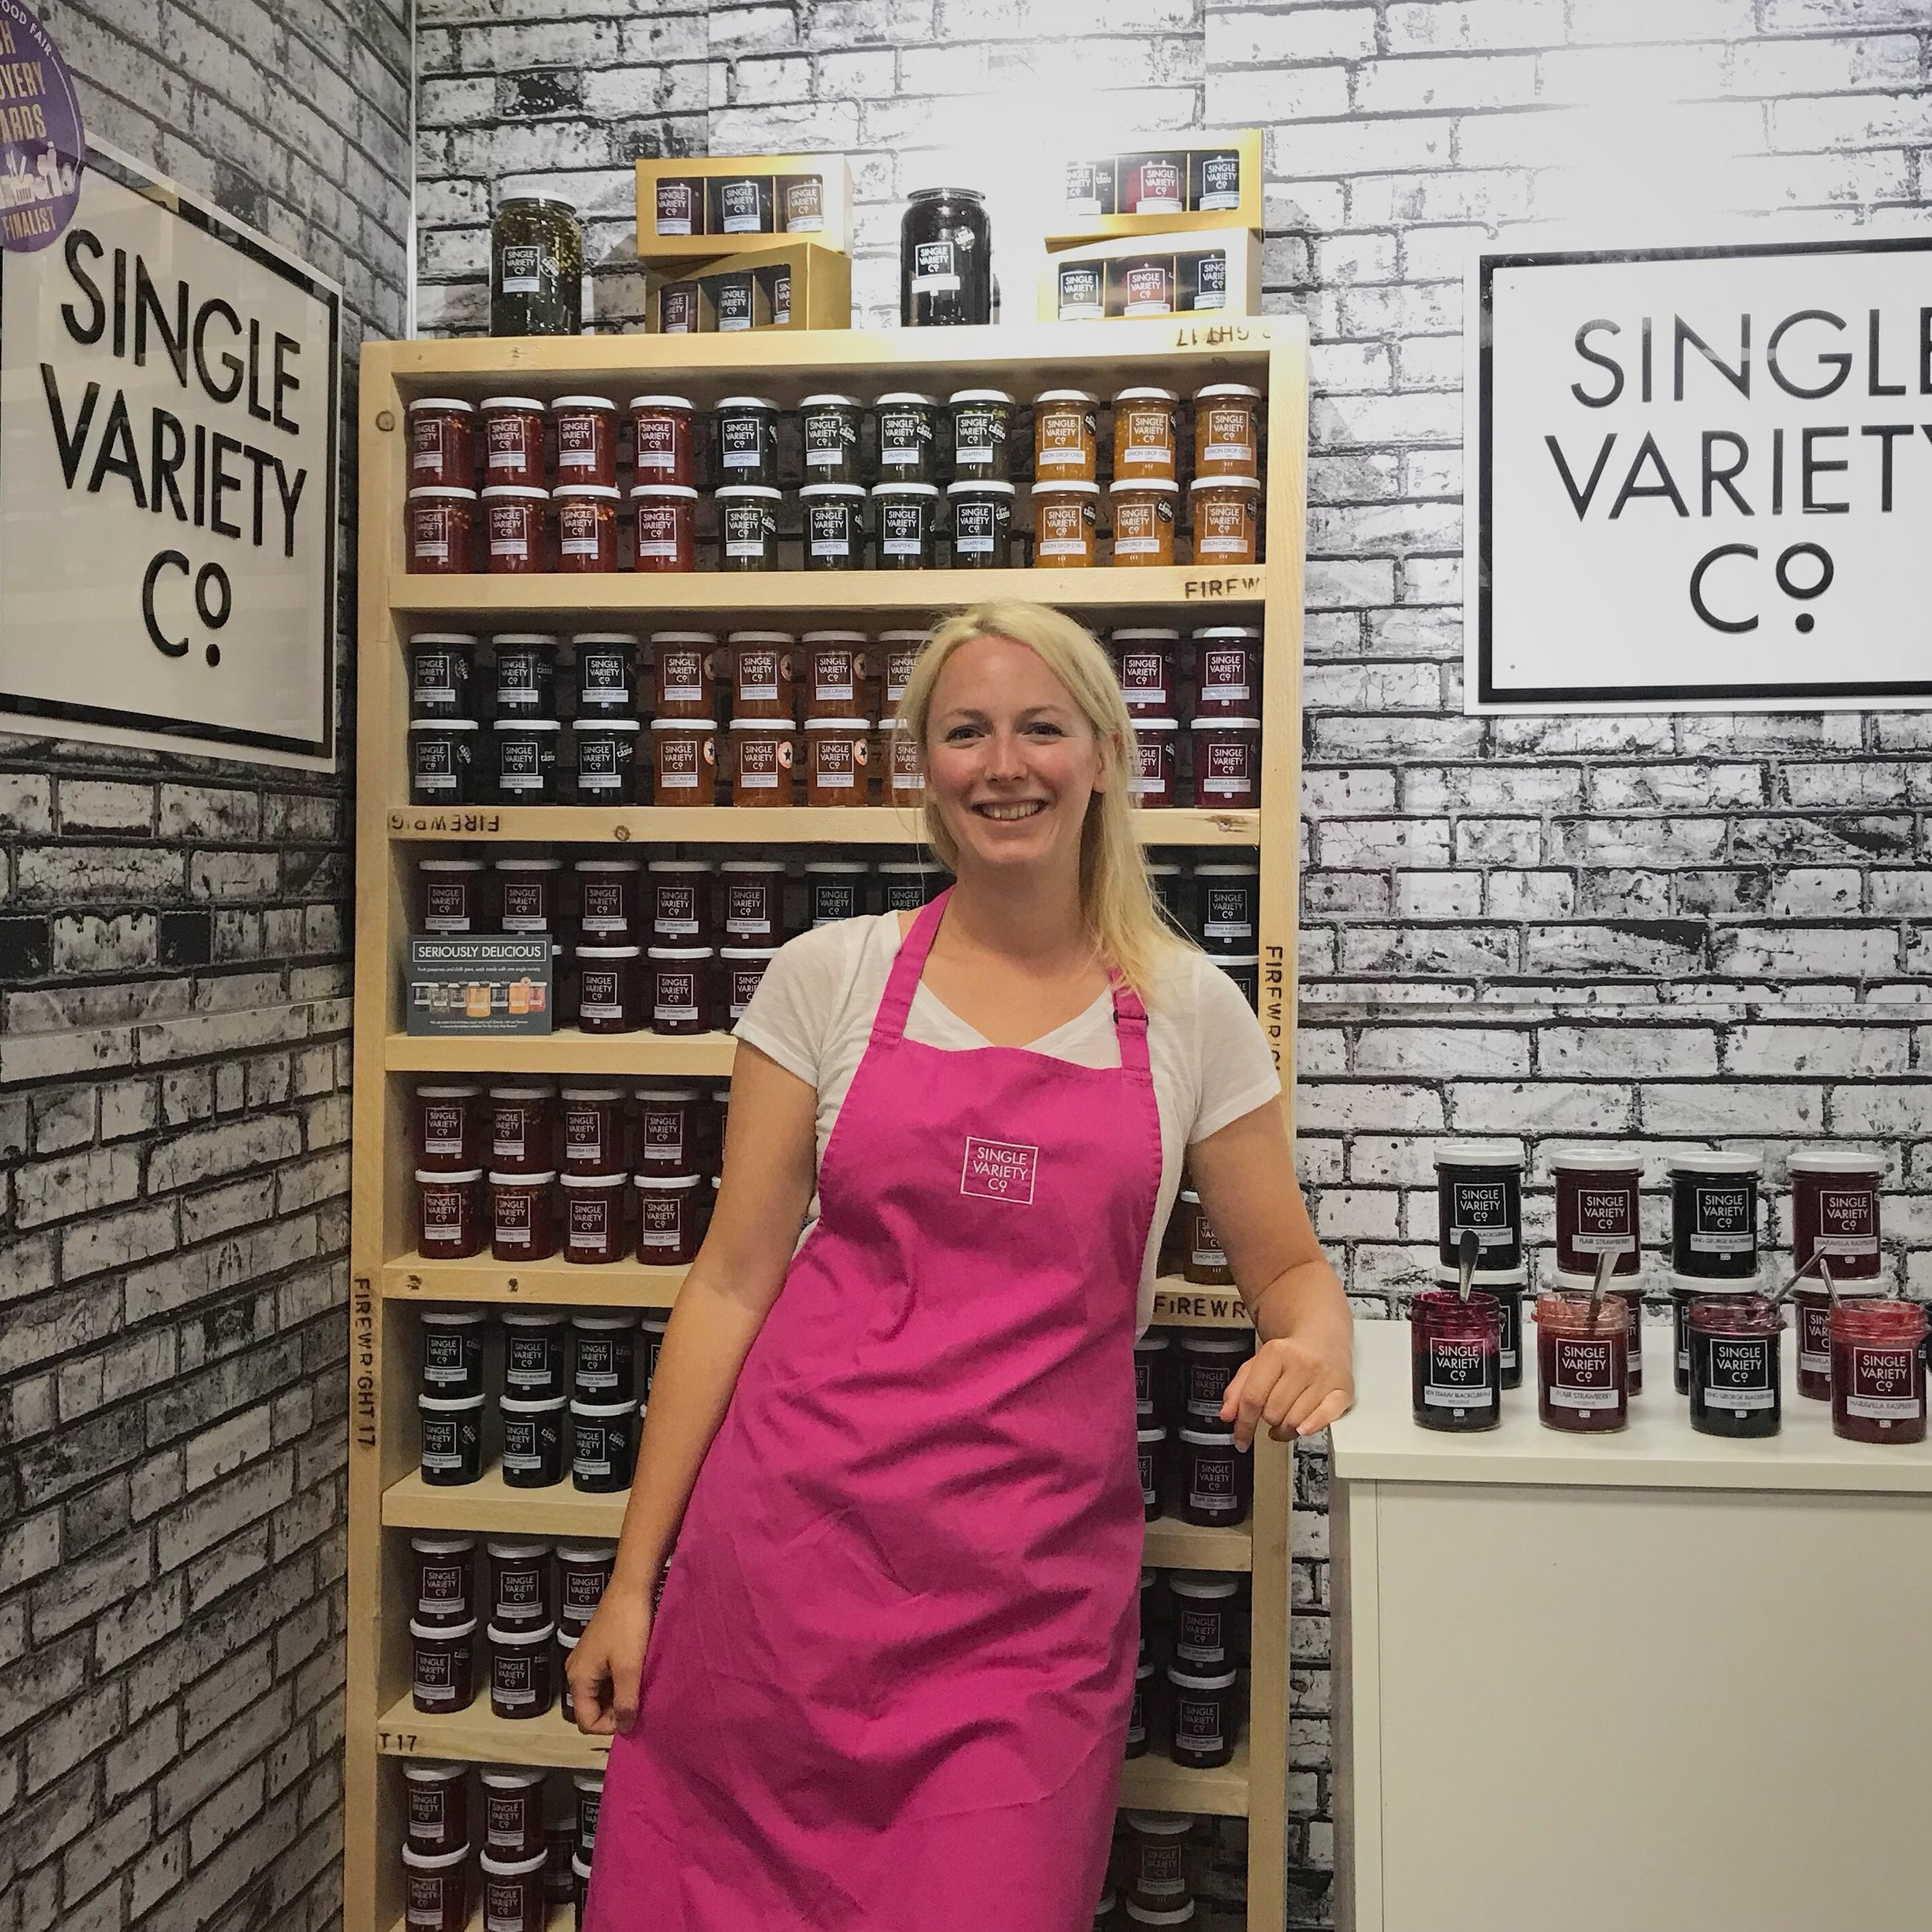 Single Variety Co Trade Show